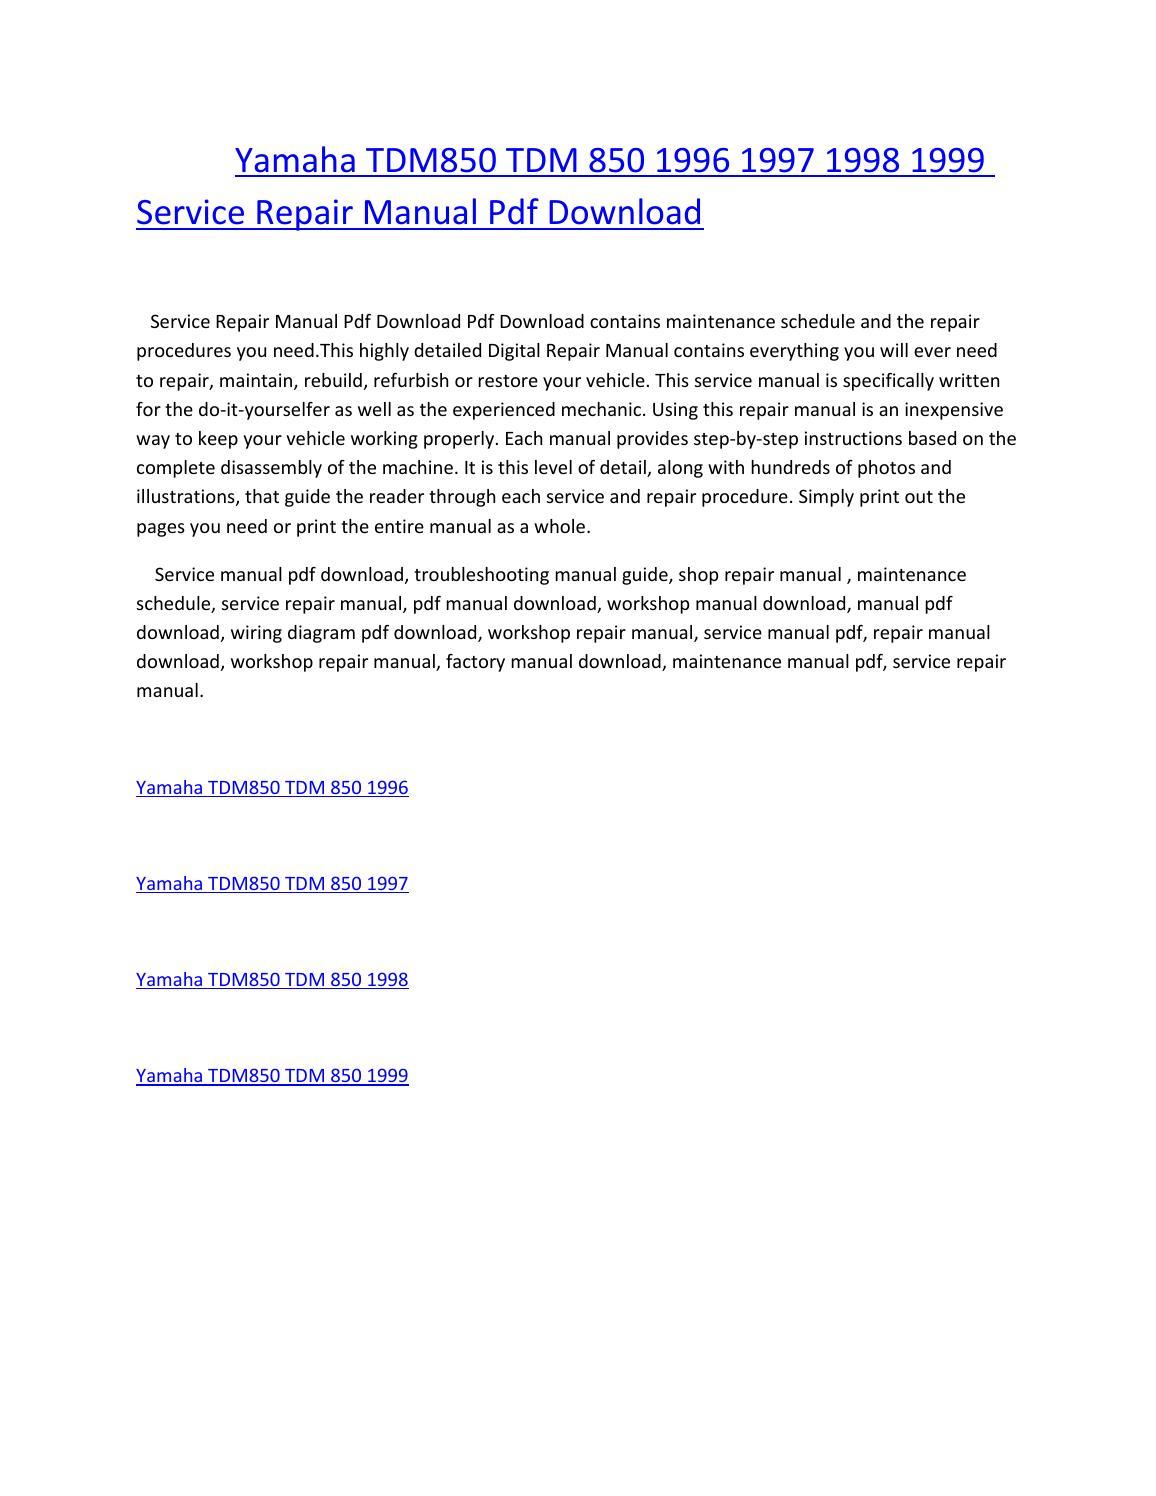 yamaha tdm850 tdm 850 1996 1997 1998 1999 service repair manual pdf  download by amurgului - issuu